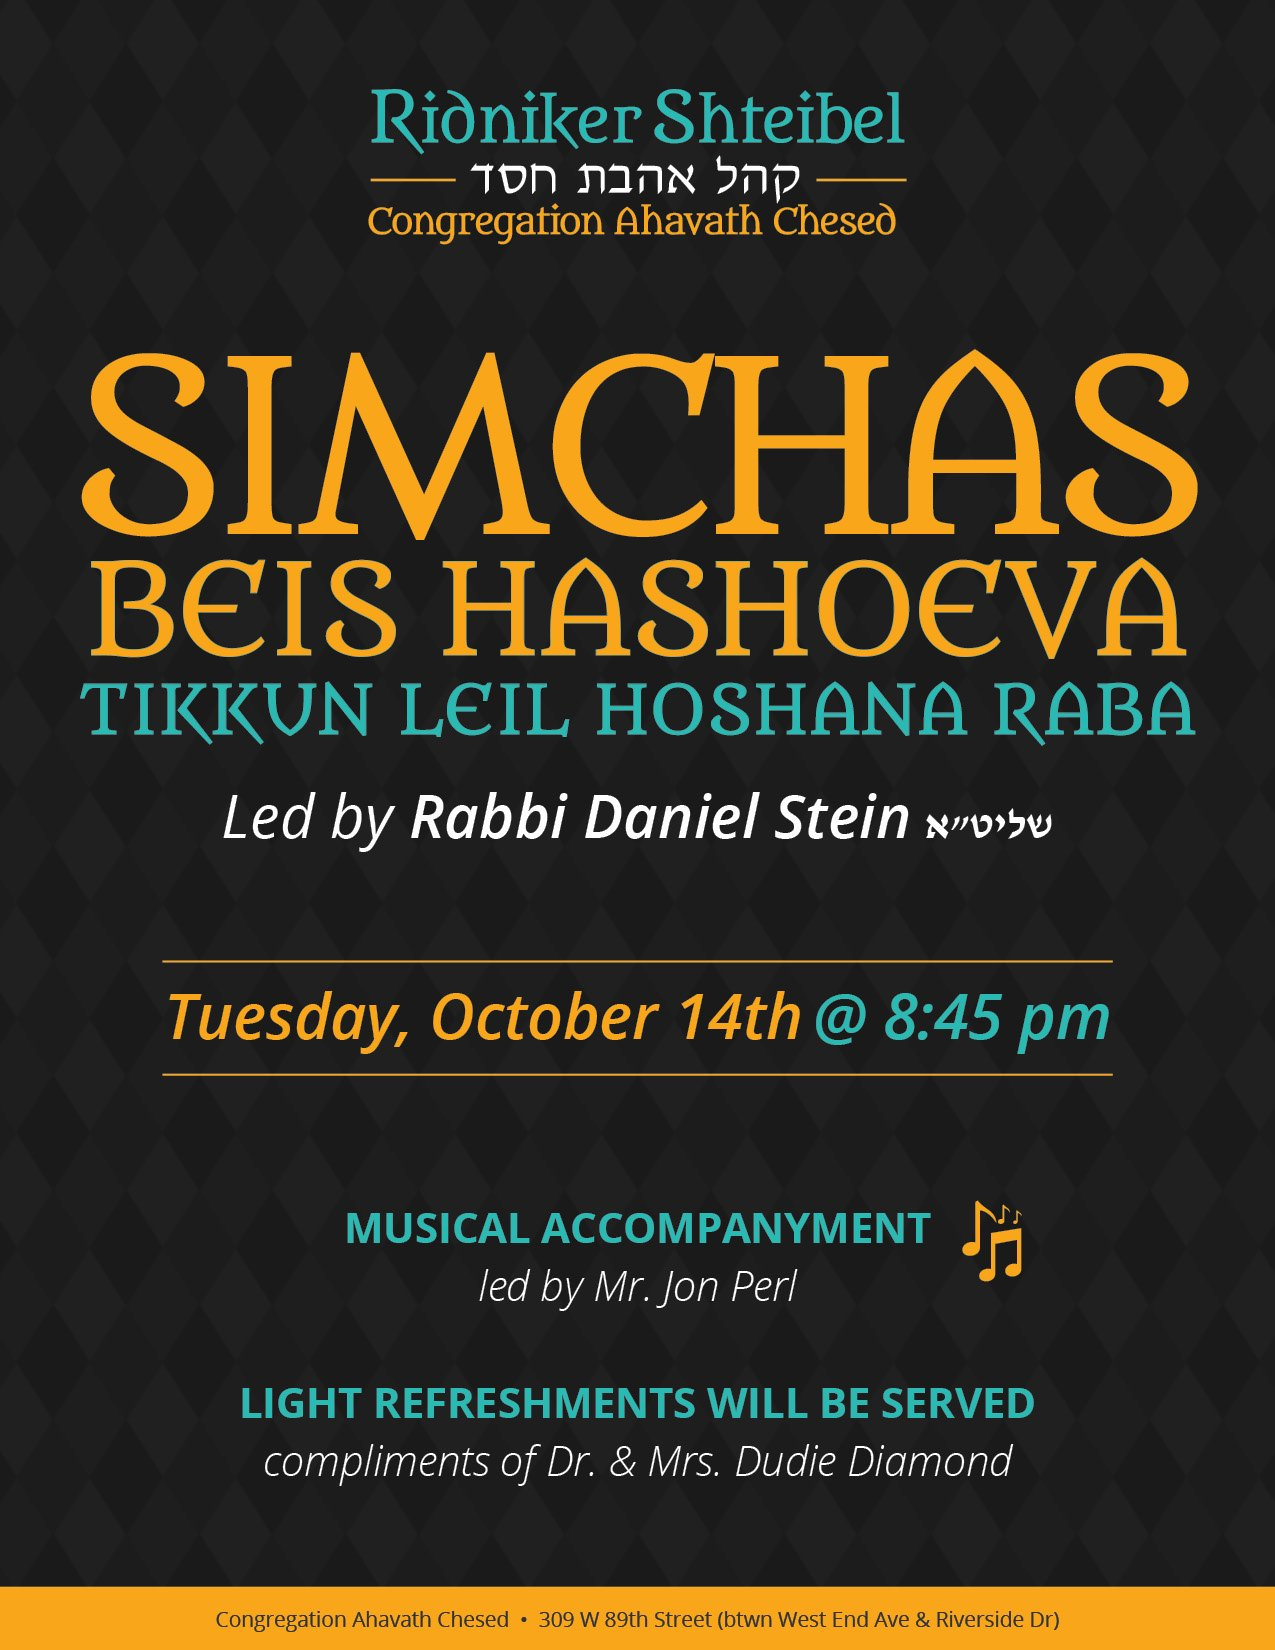 Simchas Beis HaShoeva